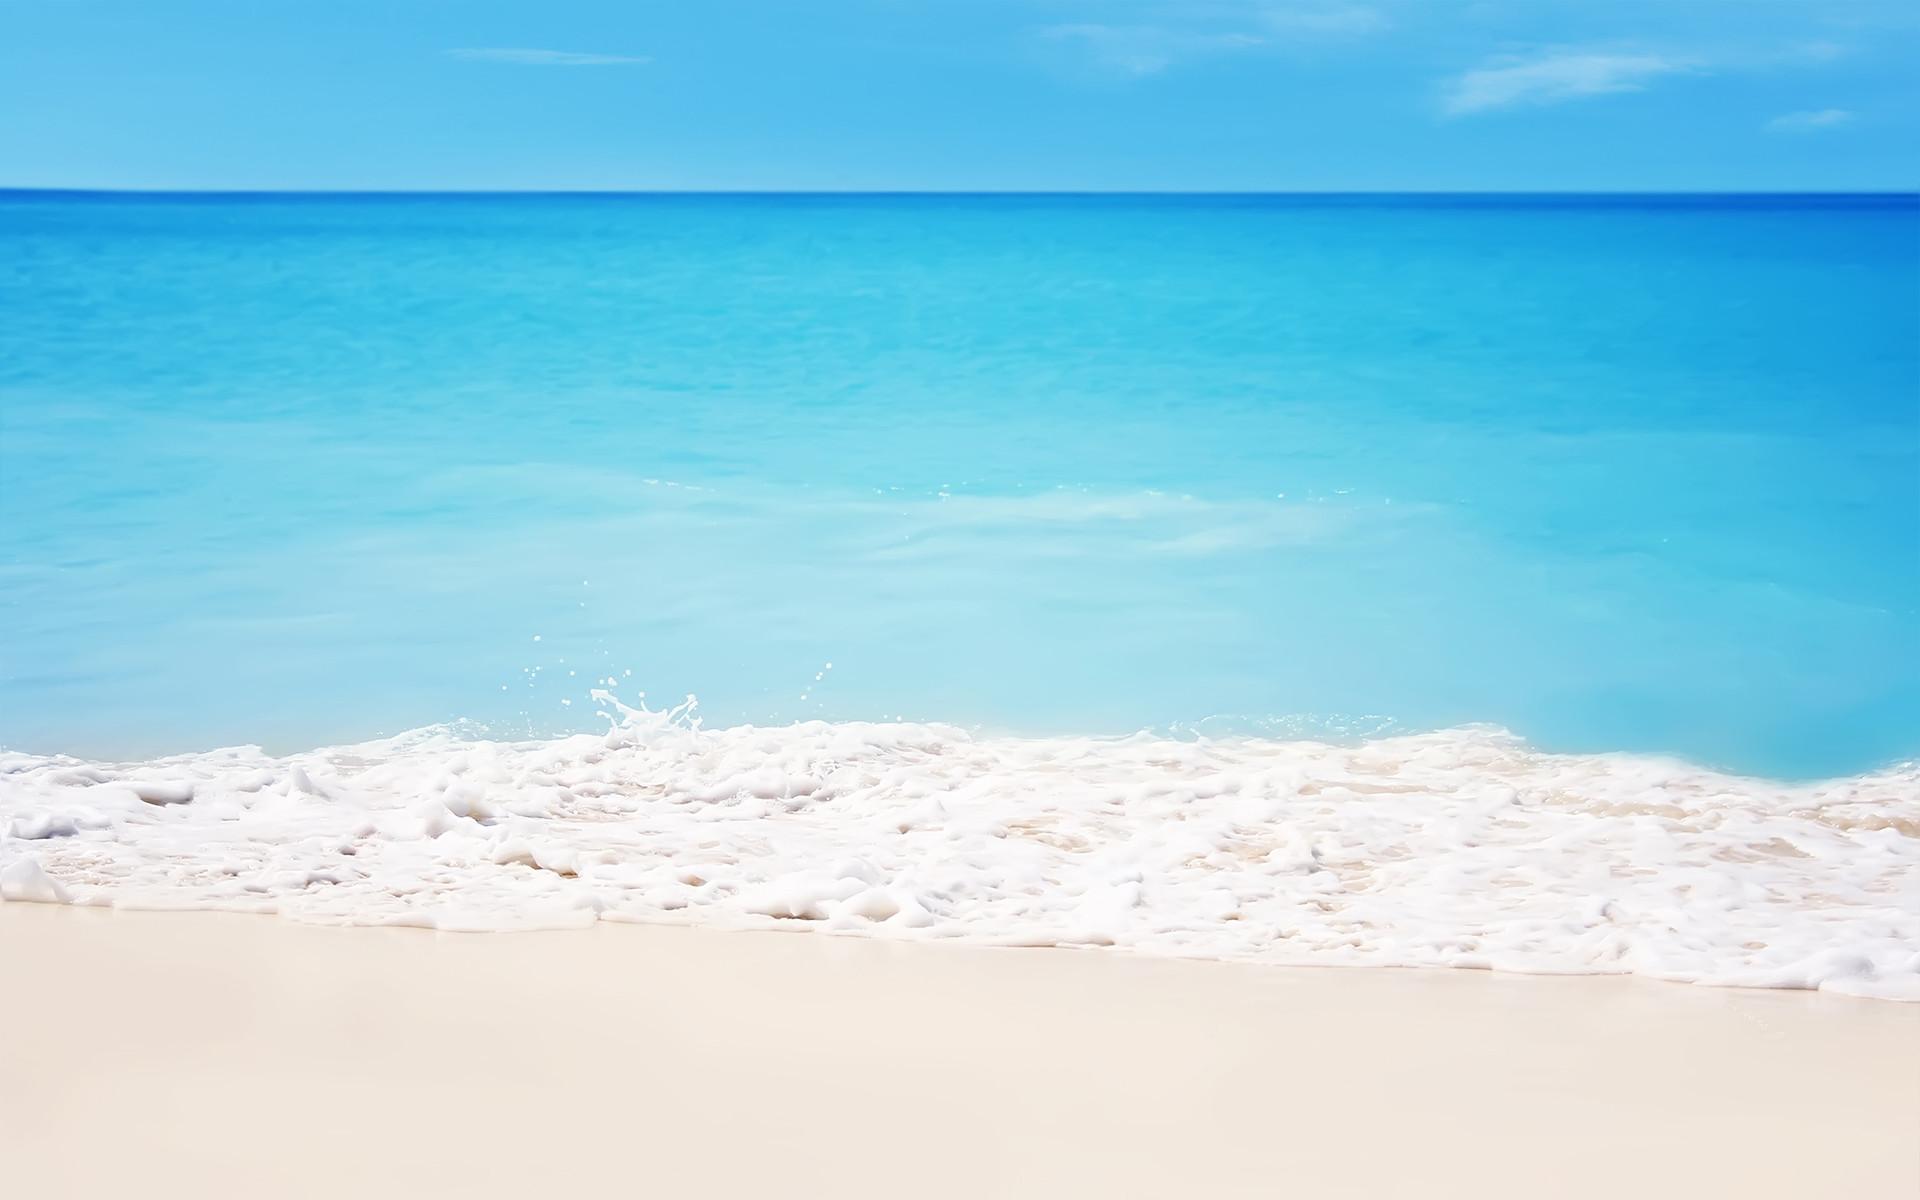 Ocean And Sand Wallpaper 1920×1200